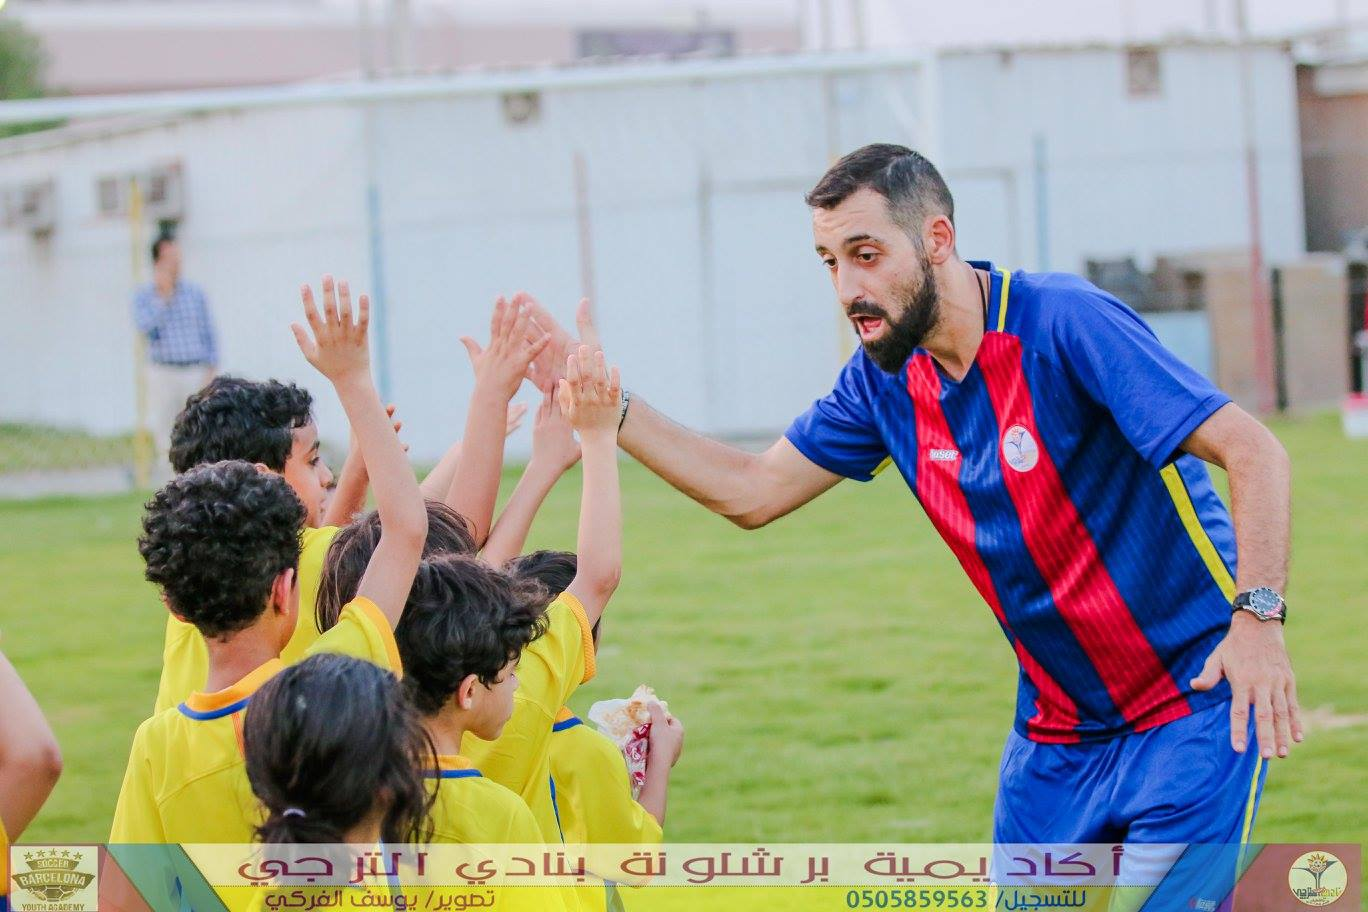 SOCCER LESSONS AL-TARAJI (juliol 2017)